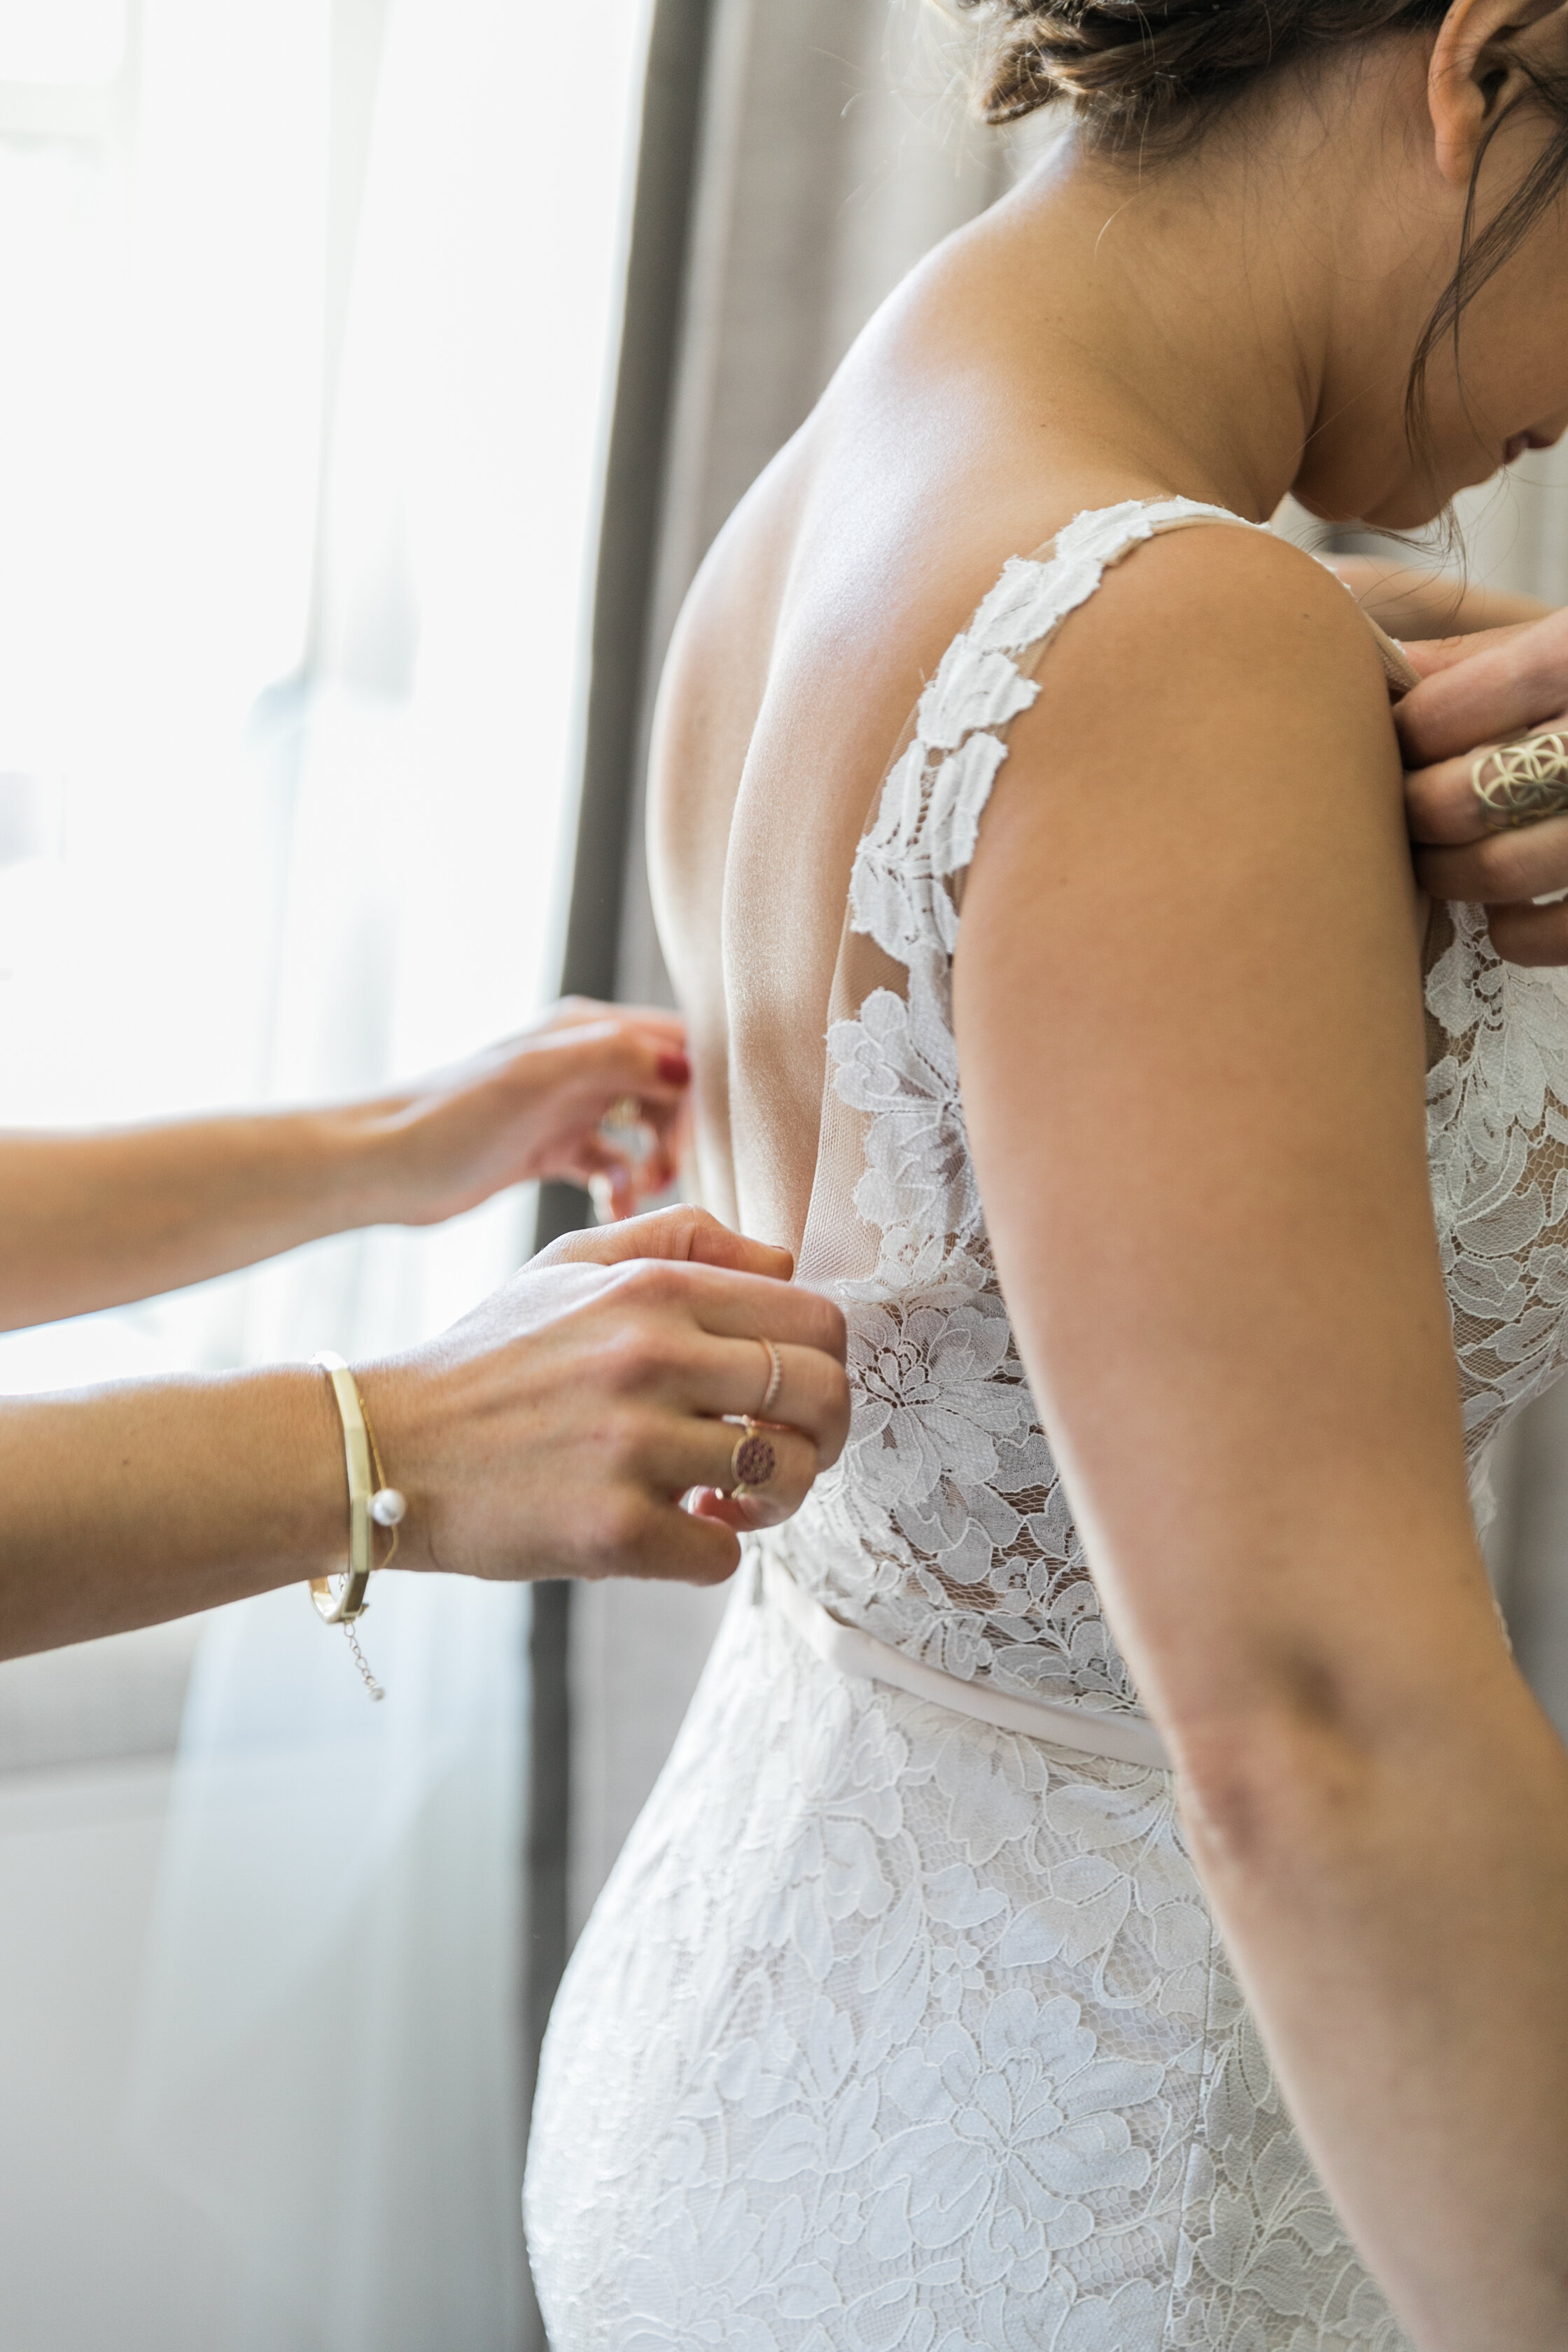 ivory-and-beau-blog-weddings-ivory-and-beau-couple-dominique-and-andres-savannah-florist-wedding-planning-savannah-bridal-boutique-wedding-flowers-KIP_WEBERWEDDING_RAILROADMUSEUM-202.JPG